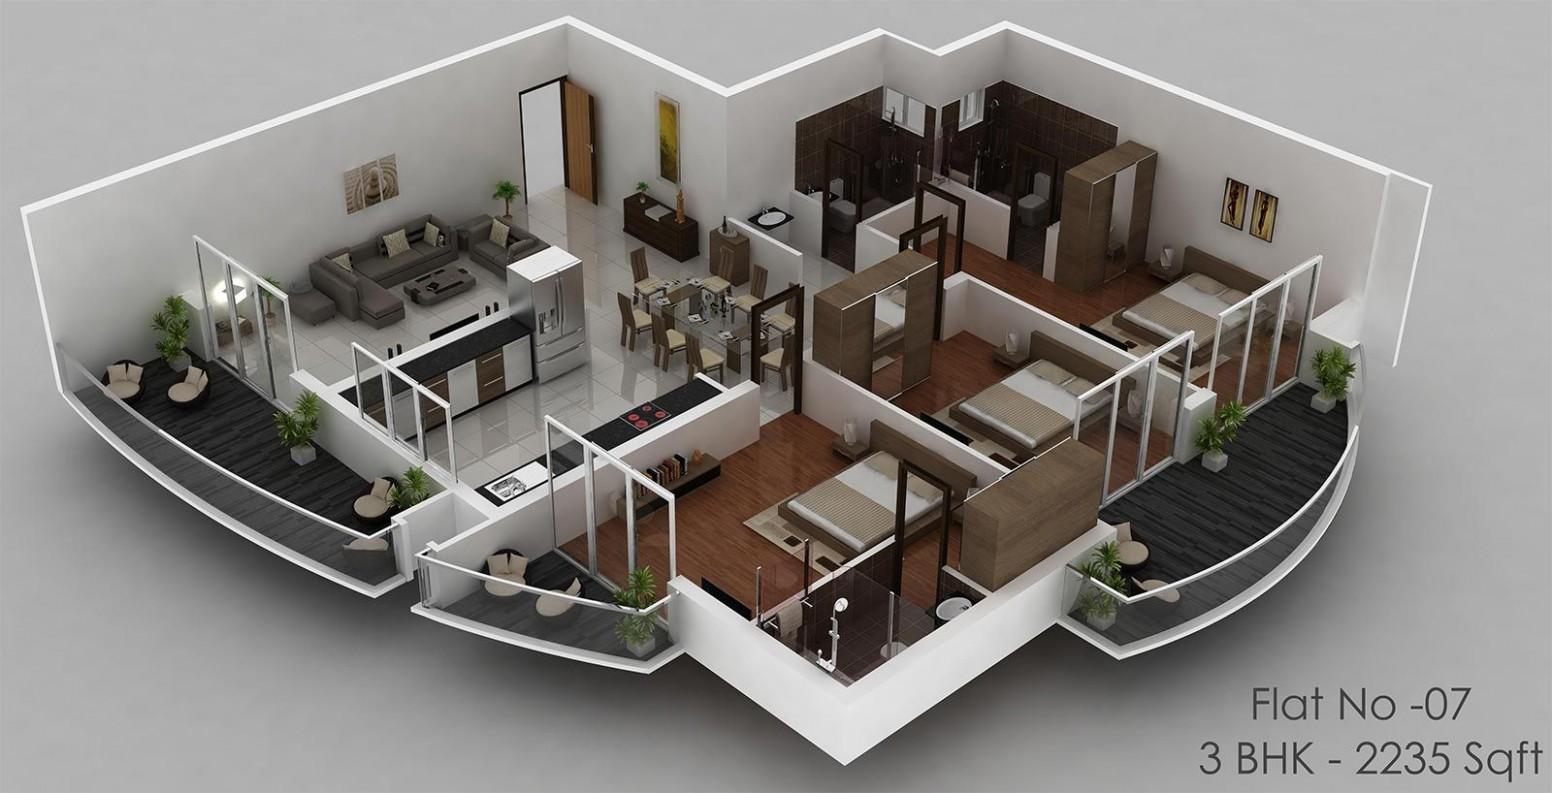 House Plan With Indoor Pool - Duplex Floor Plan 12D Design #28912  - Apartment Duplex Design